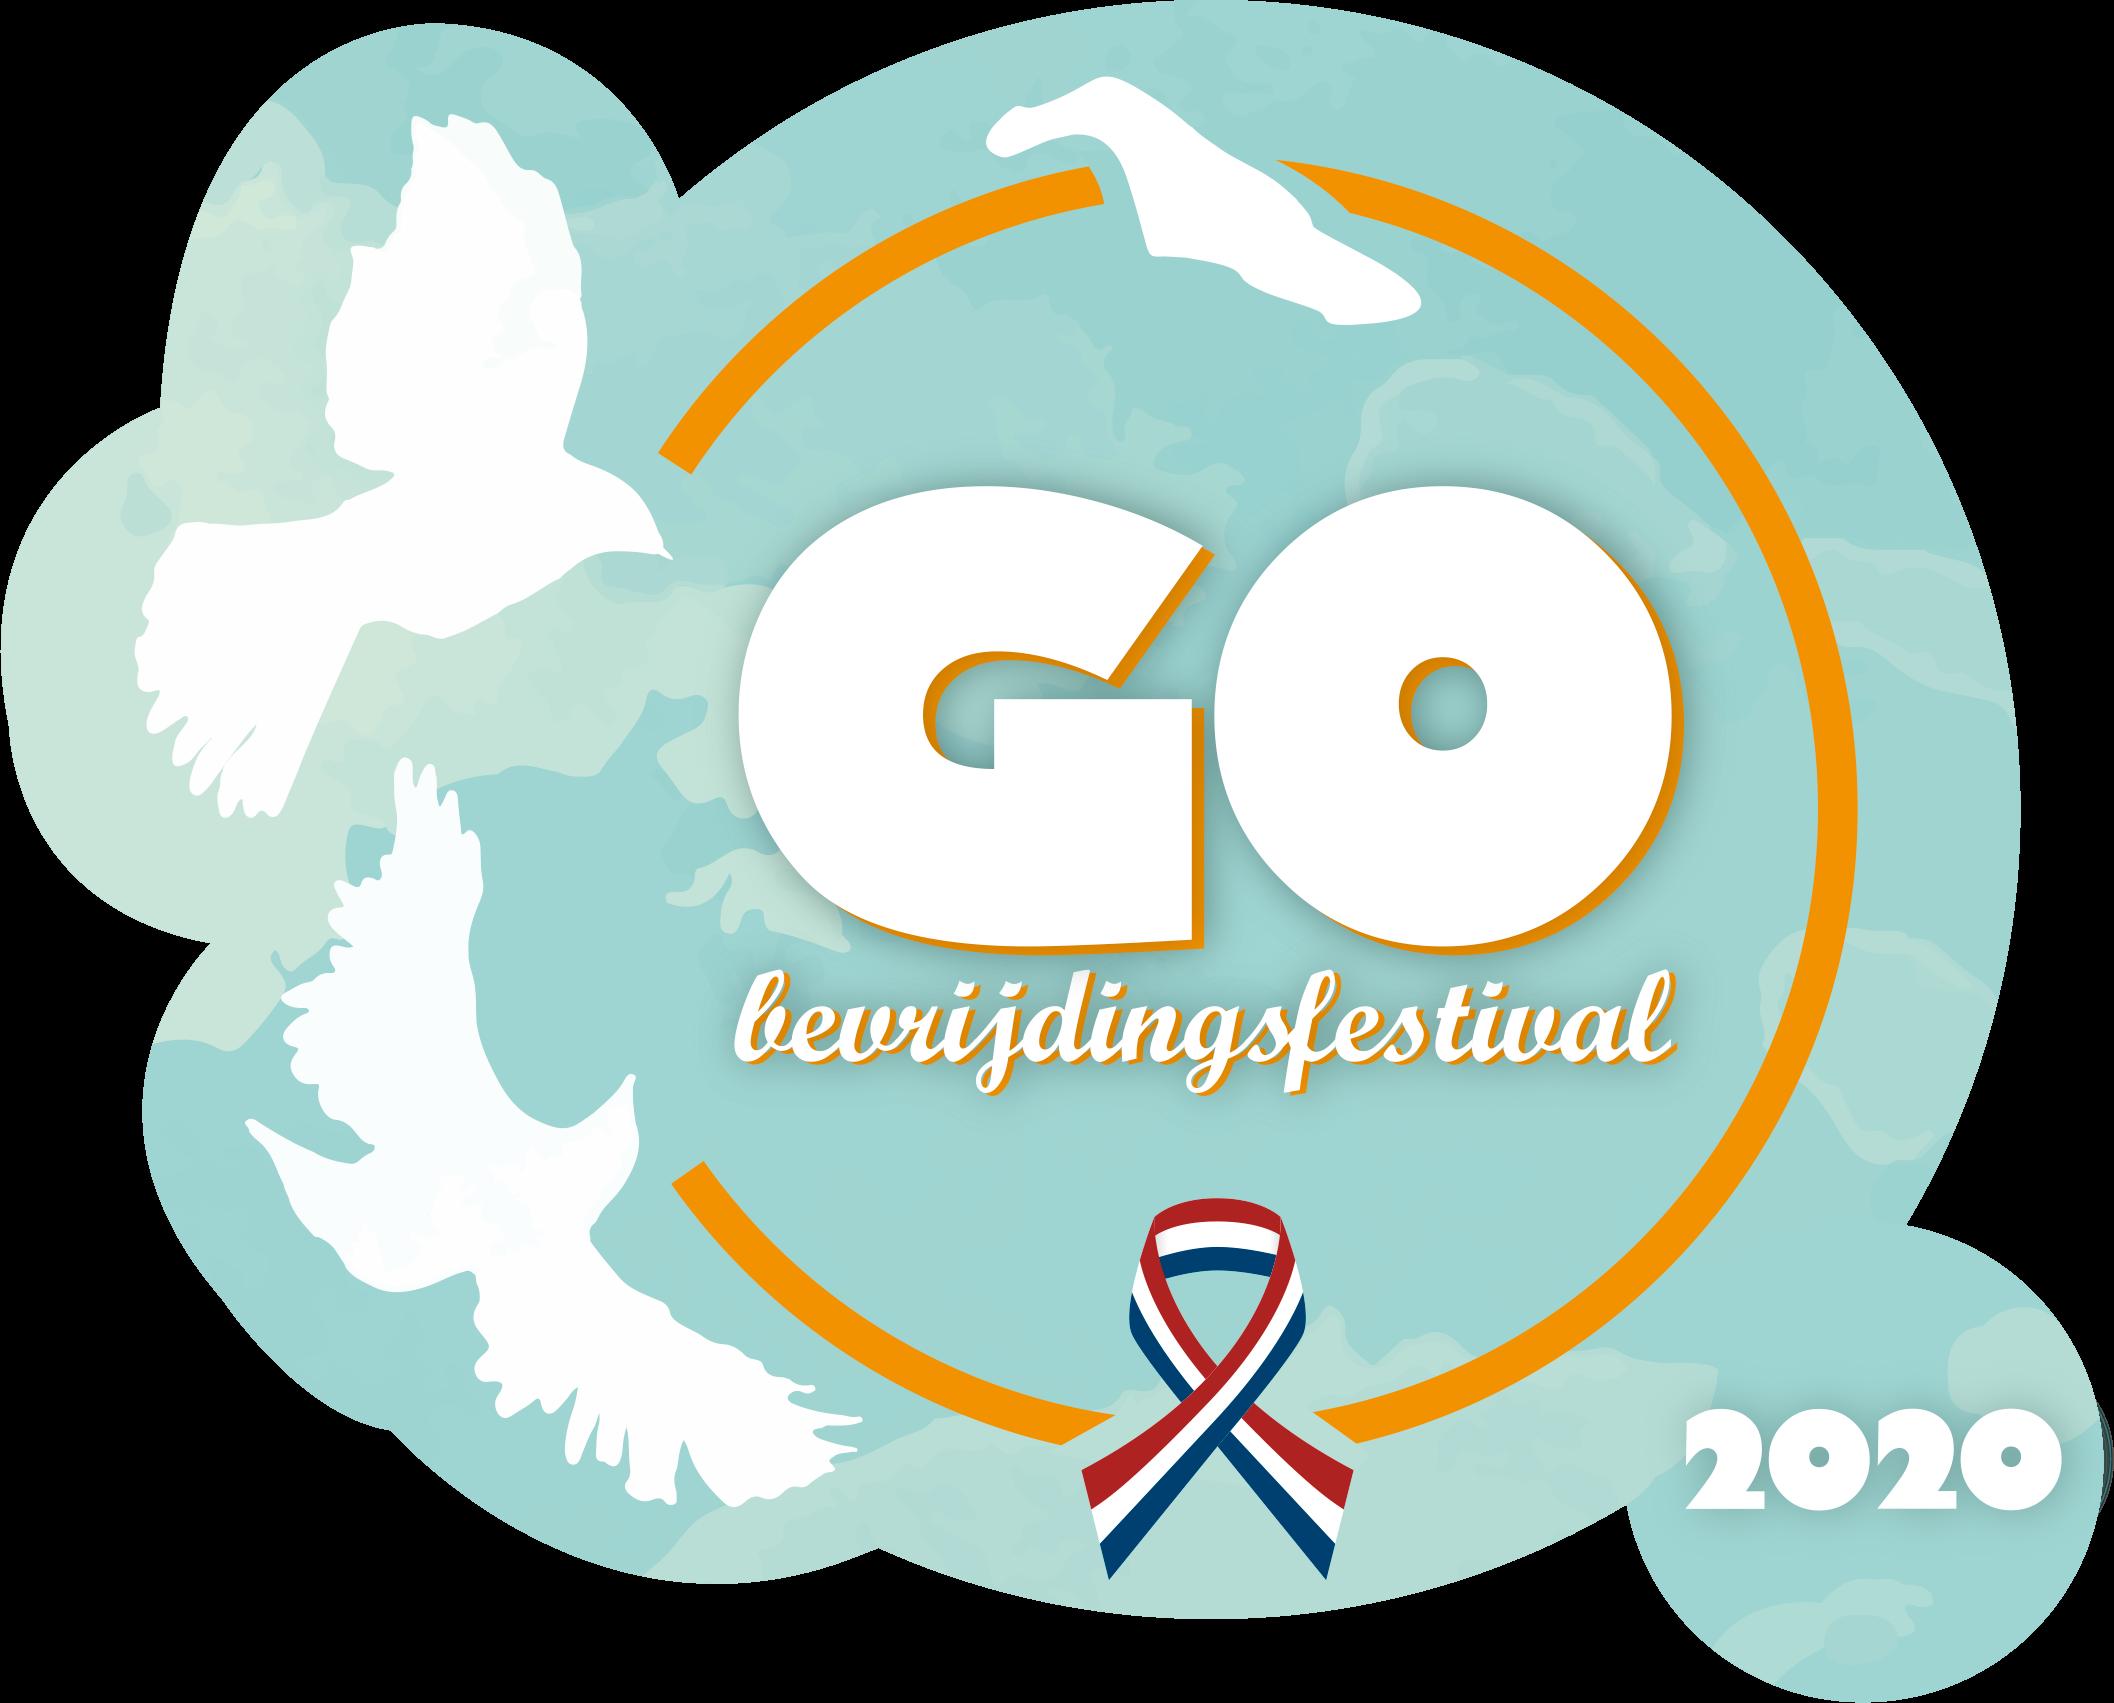 Bevrijdingsfestival Goeree-Overflakkee